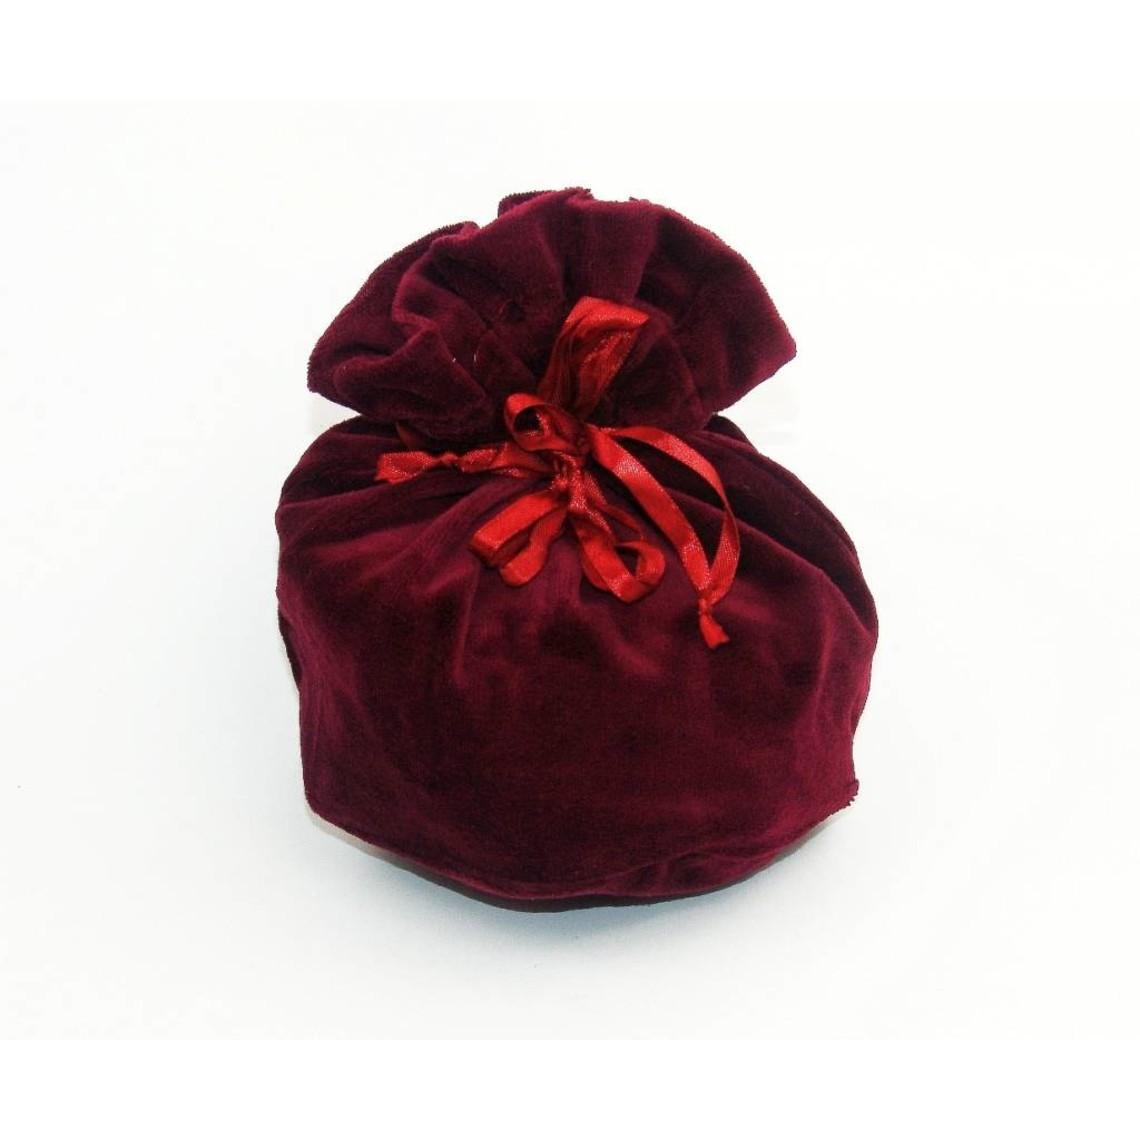 Leonardo Carbone Luxe buidel Susanna, rood